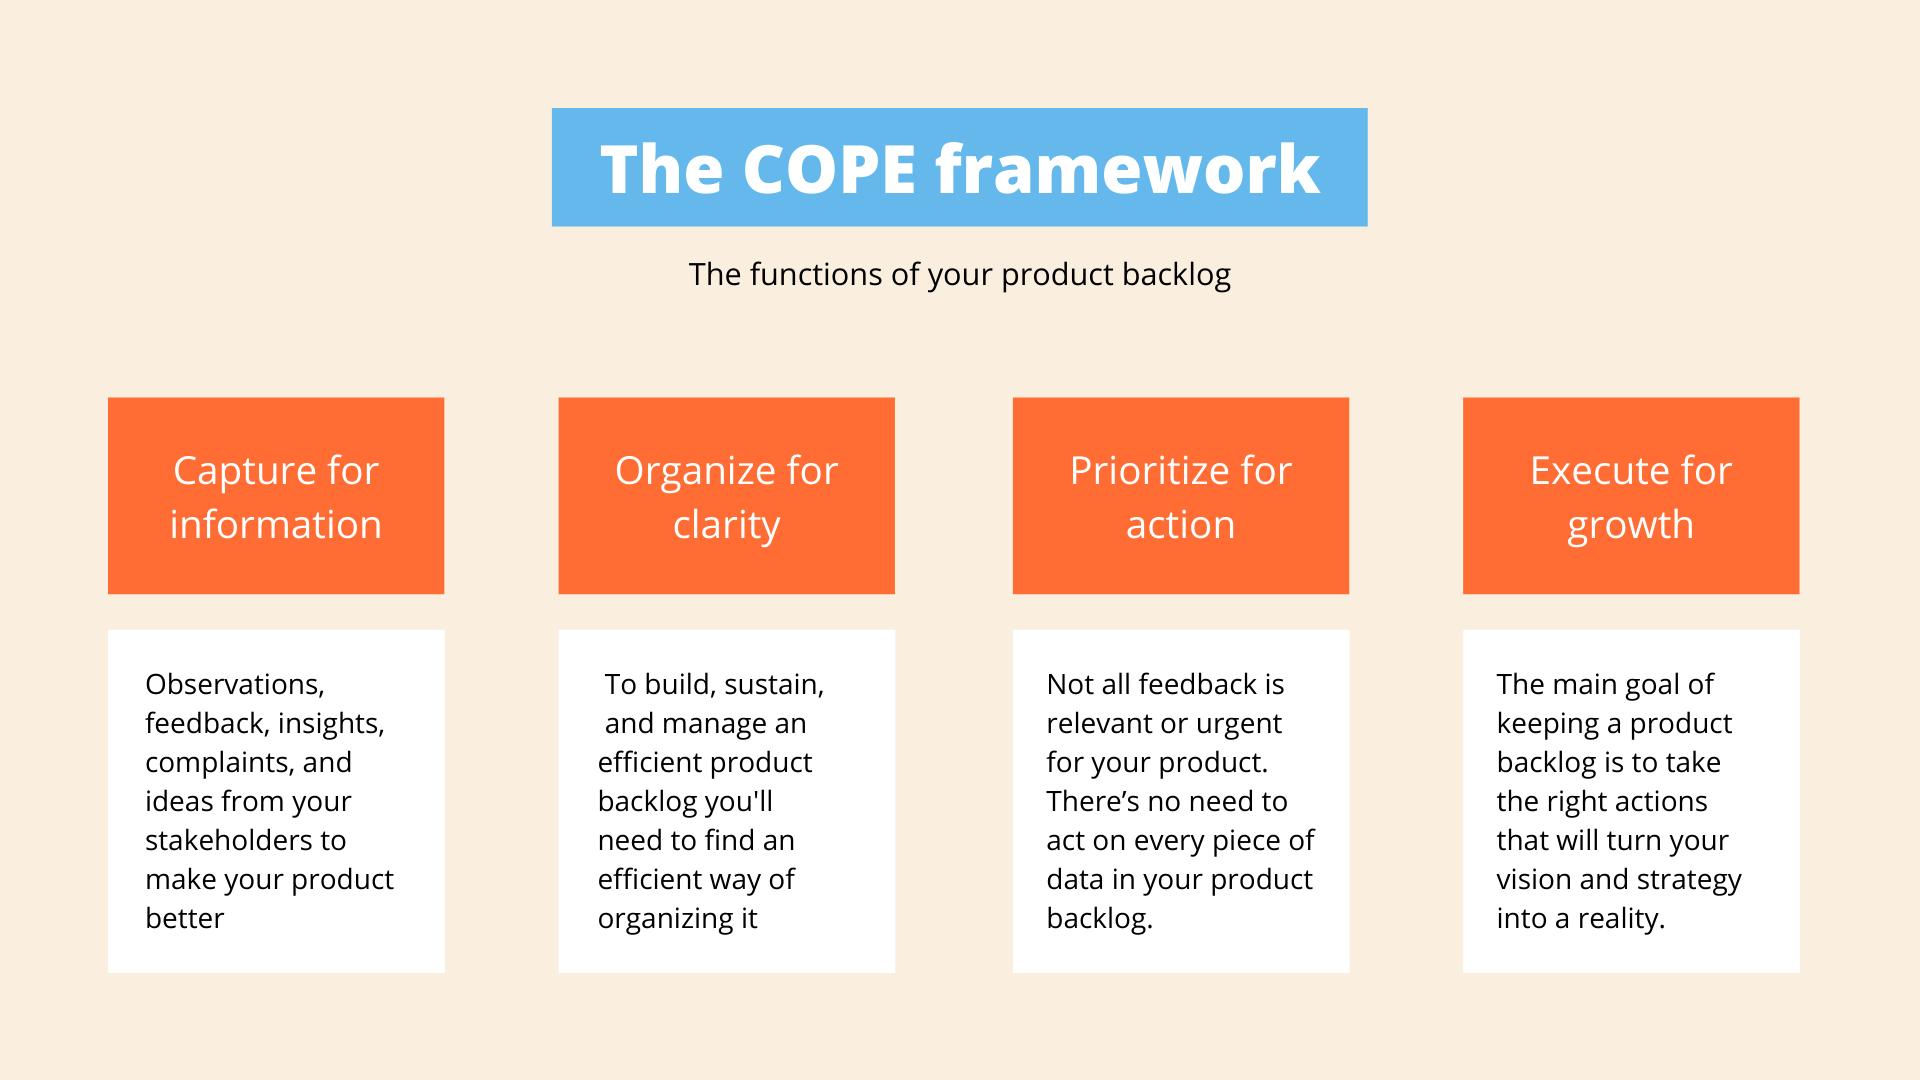 COPE framework